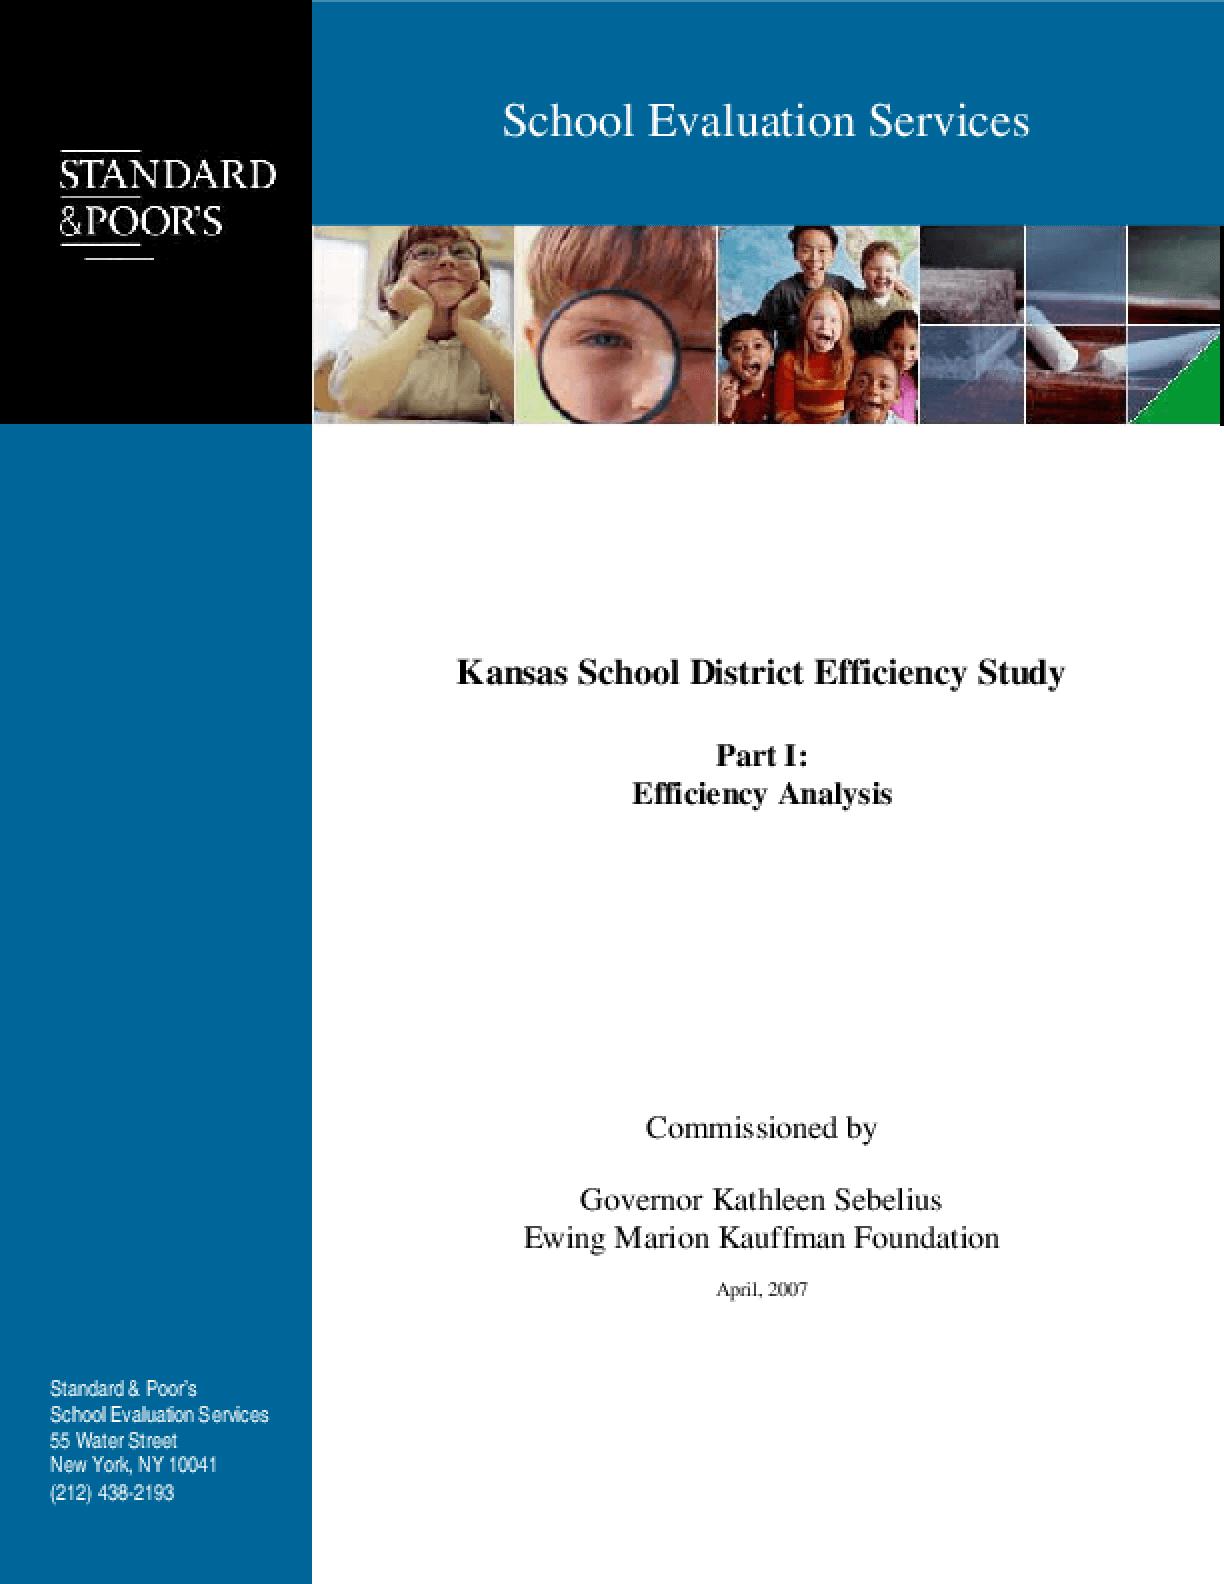 Kansas School District Efficiency Study Part I: Efficiency Analysis